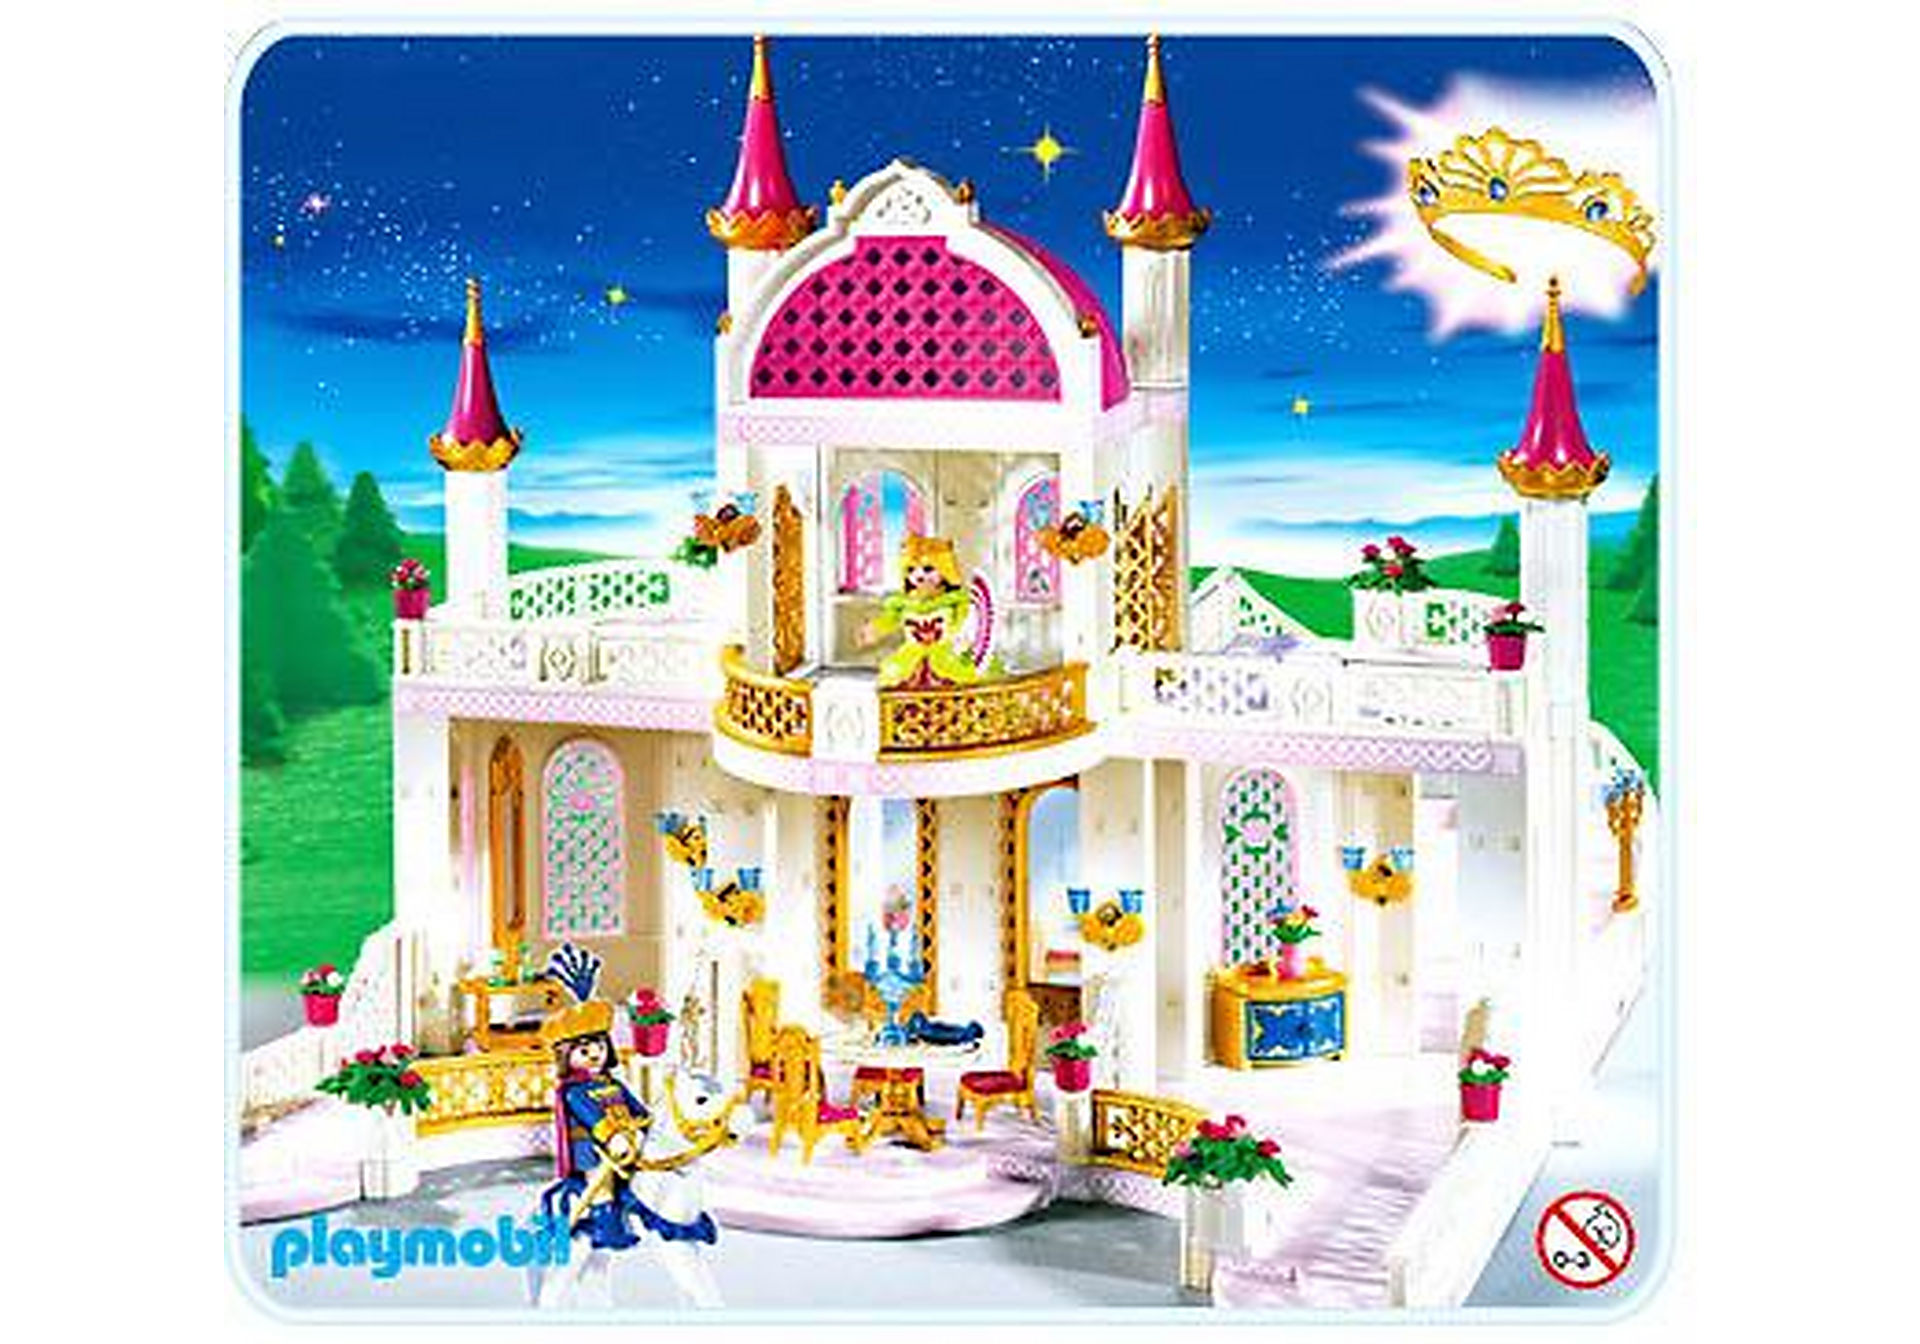 http://media.playmobil.com/i/playmobil/4250-A_product_detail/Märchenschloss mit Prinzessinnenkrone